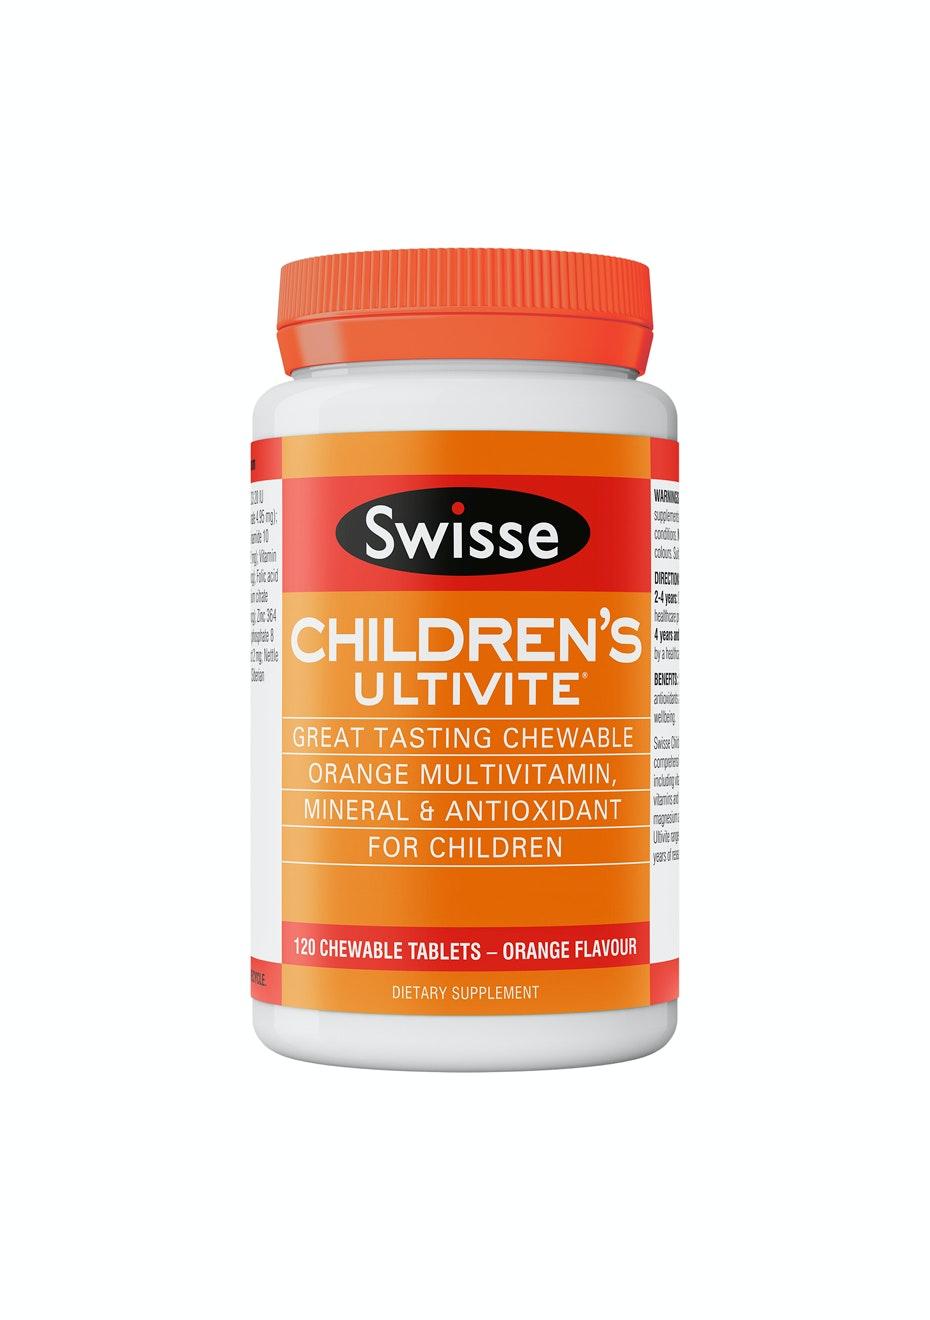 Swisse Childrens Ultivite 120 Tablets